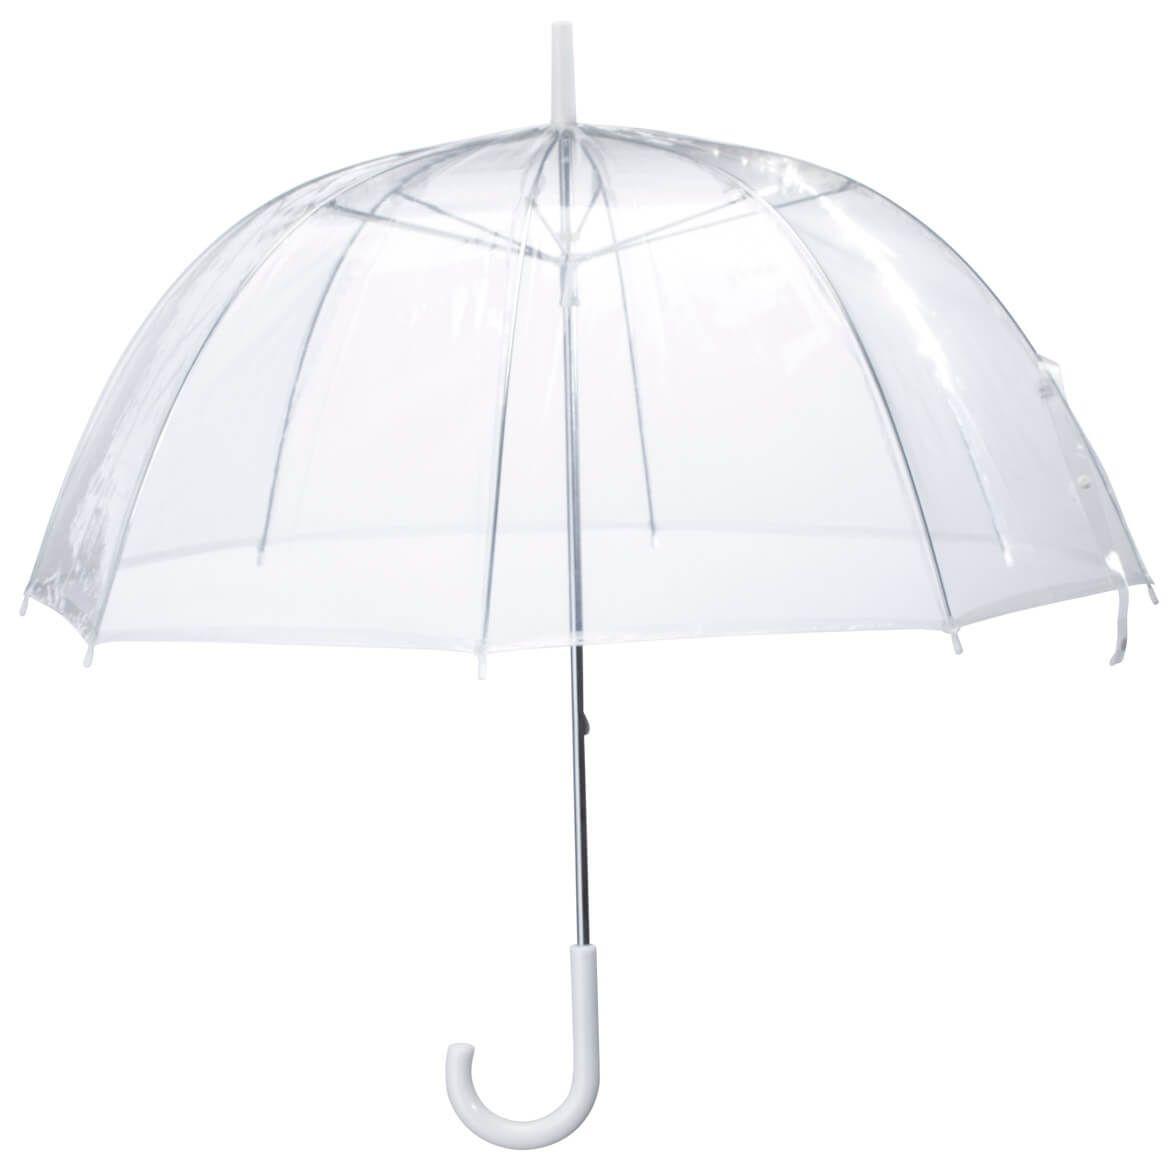 Women Clear Bubble Umbrella Waterproof Transparent Adults Rain Dome Canopy Totes